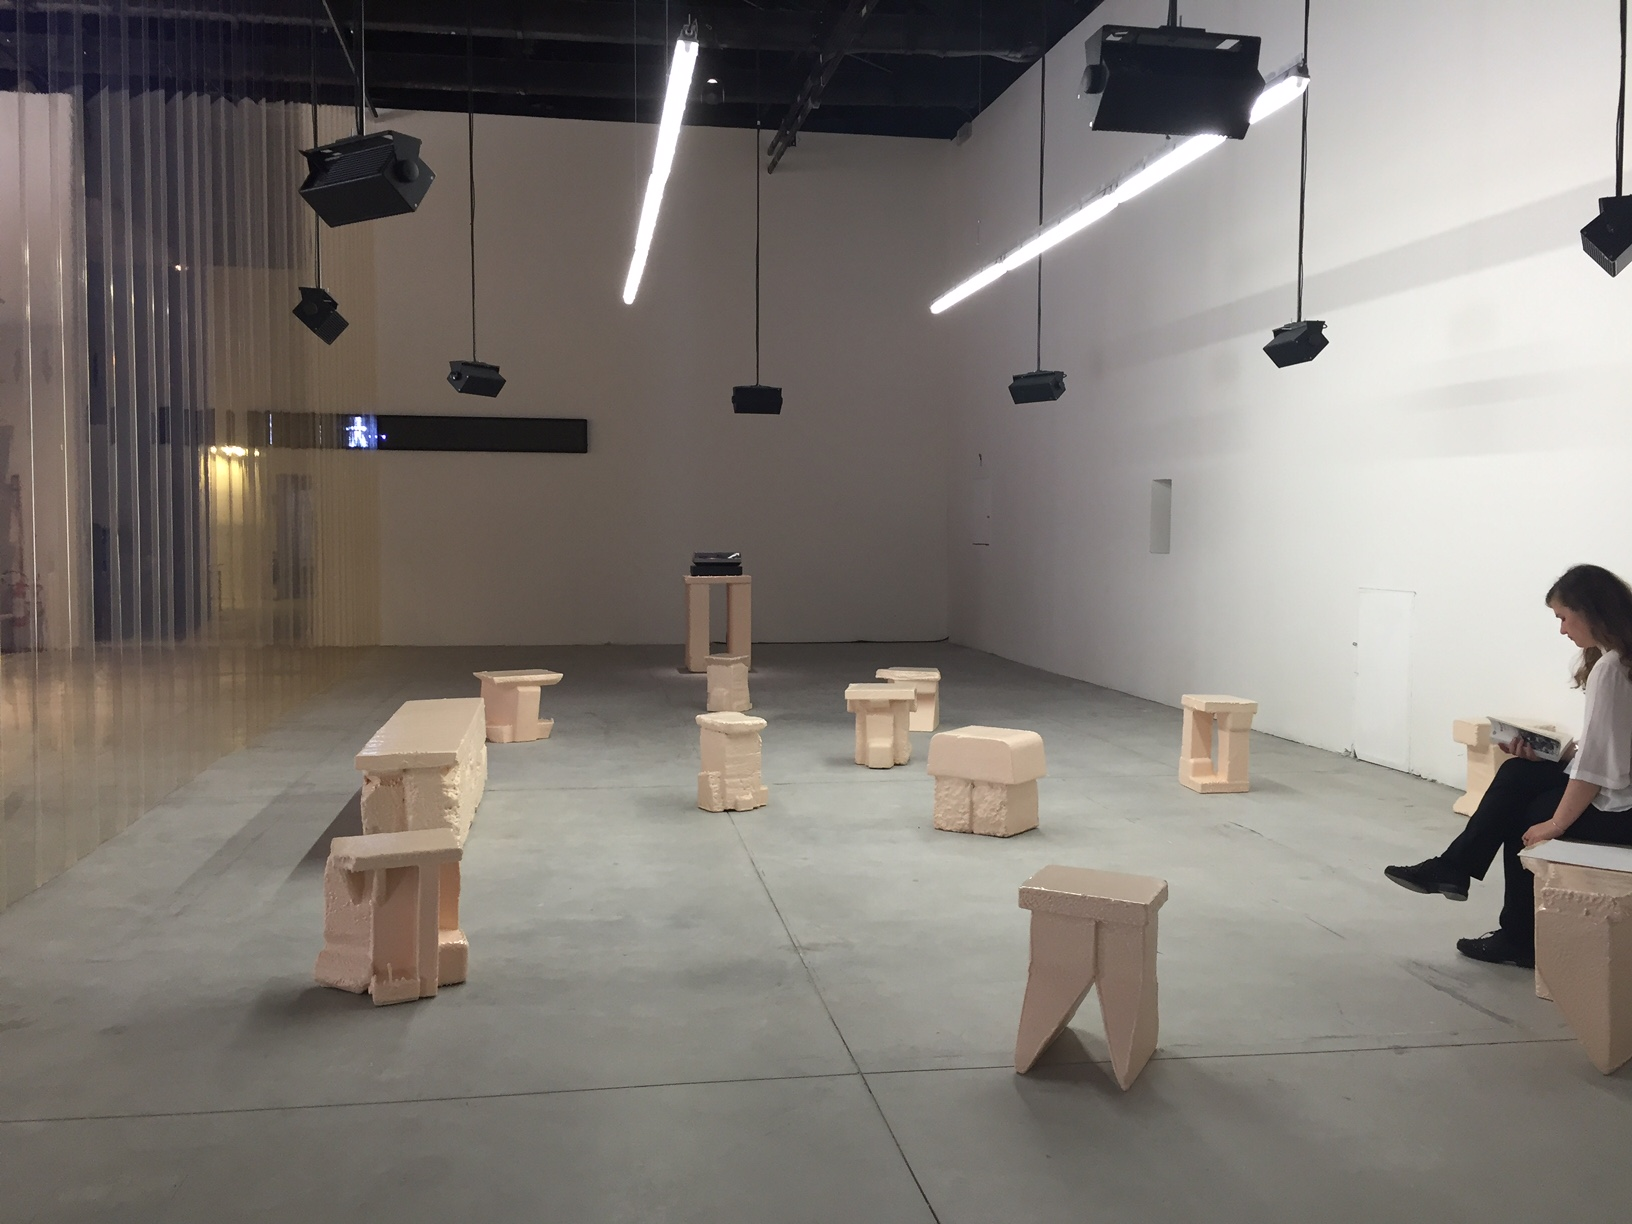 Padiglione Albania, Biennale Architettura 2016 (Foto Artslife)